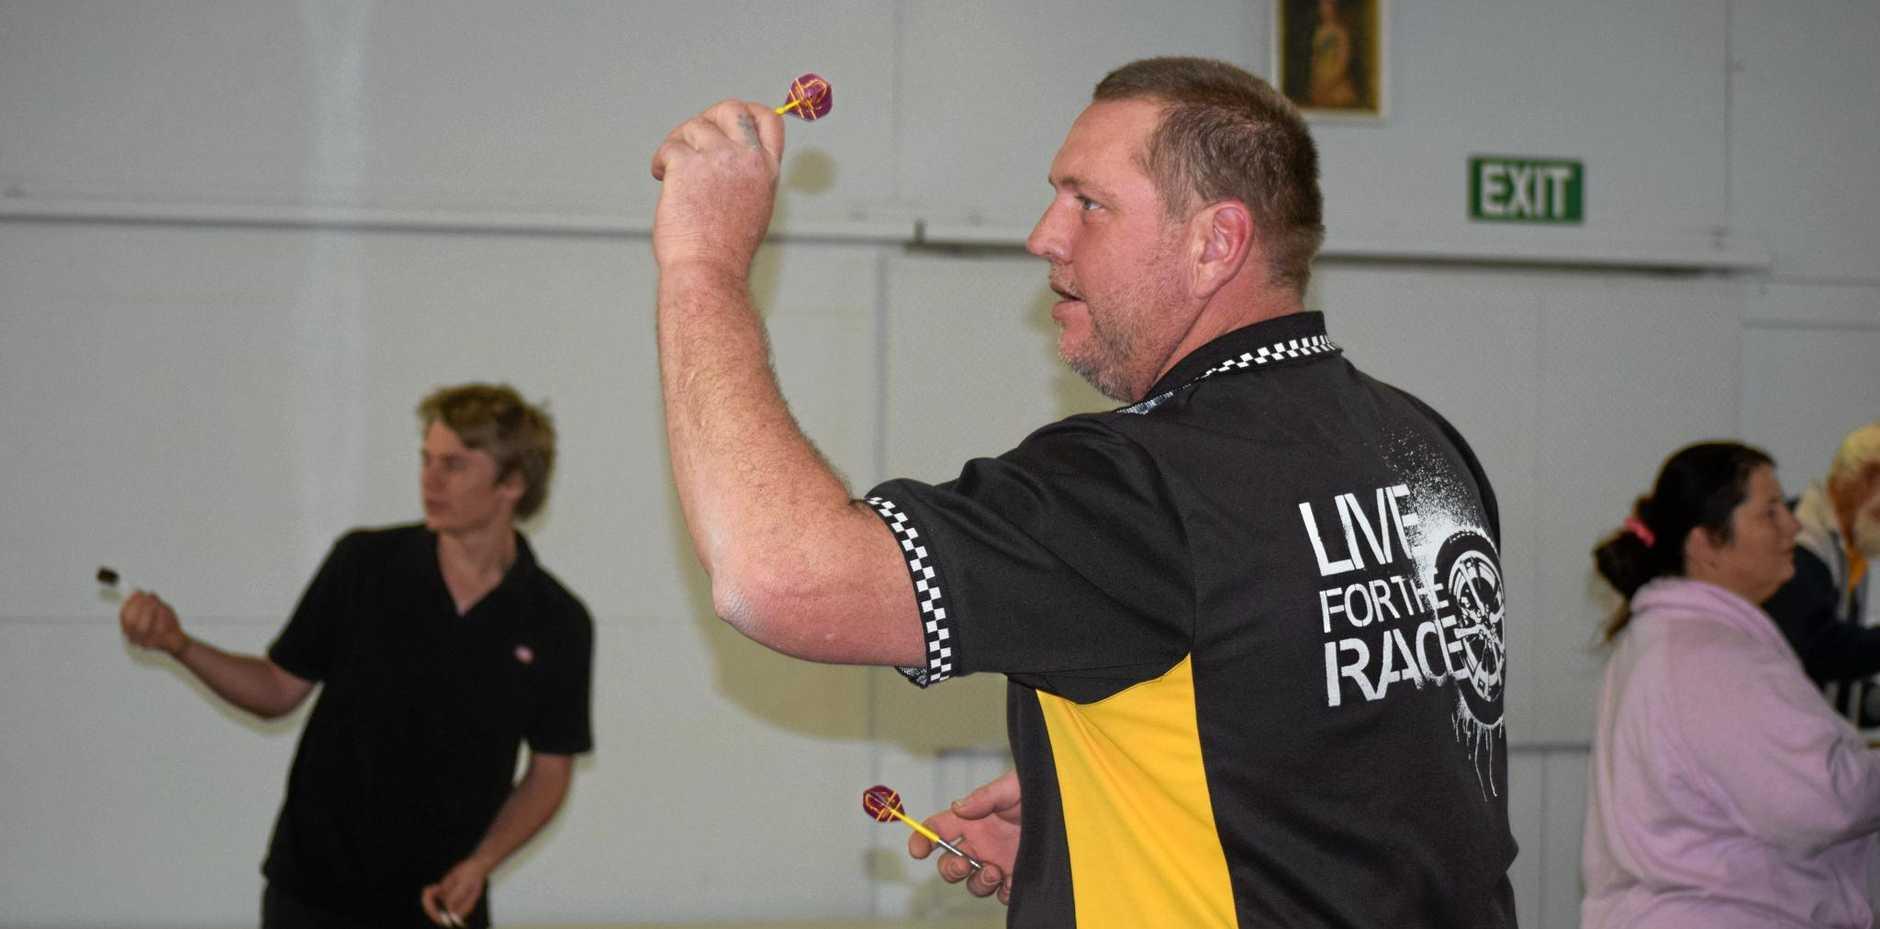 BULLSEYE: Al Volmerhause is proving to be a great asset in the Mundubbera Darts Association.